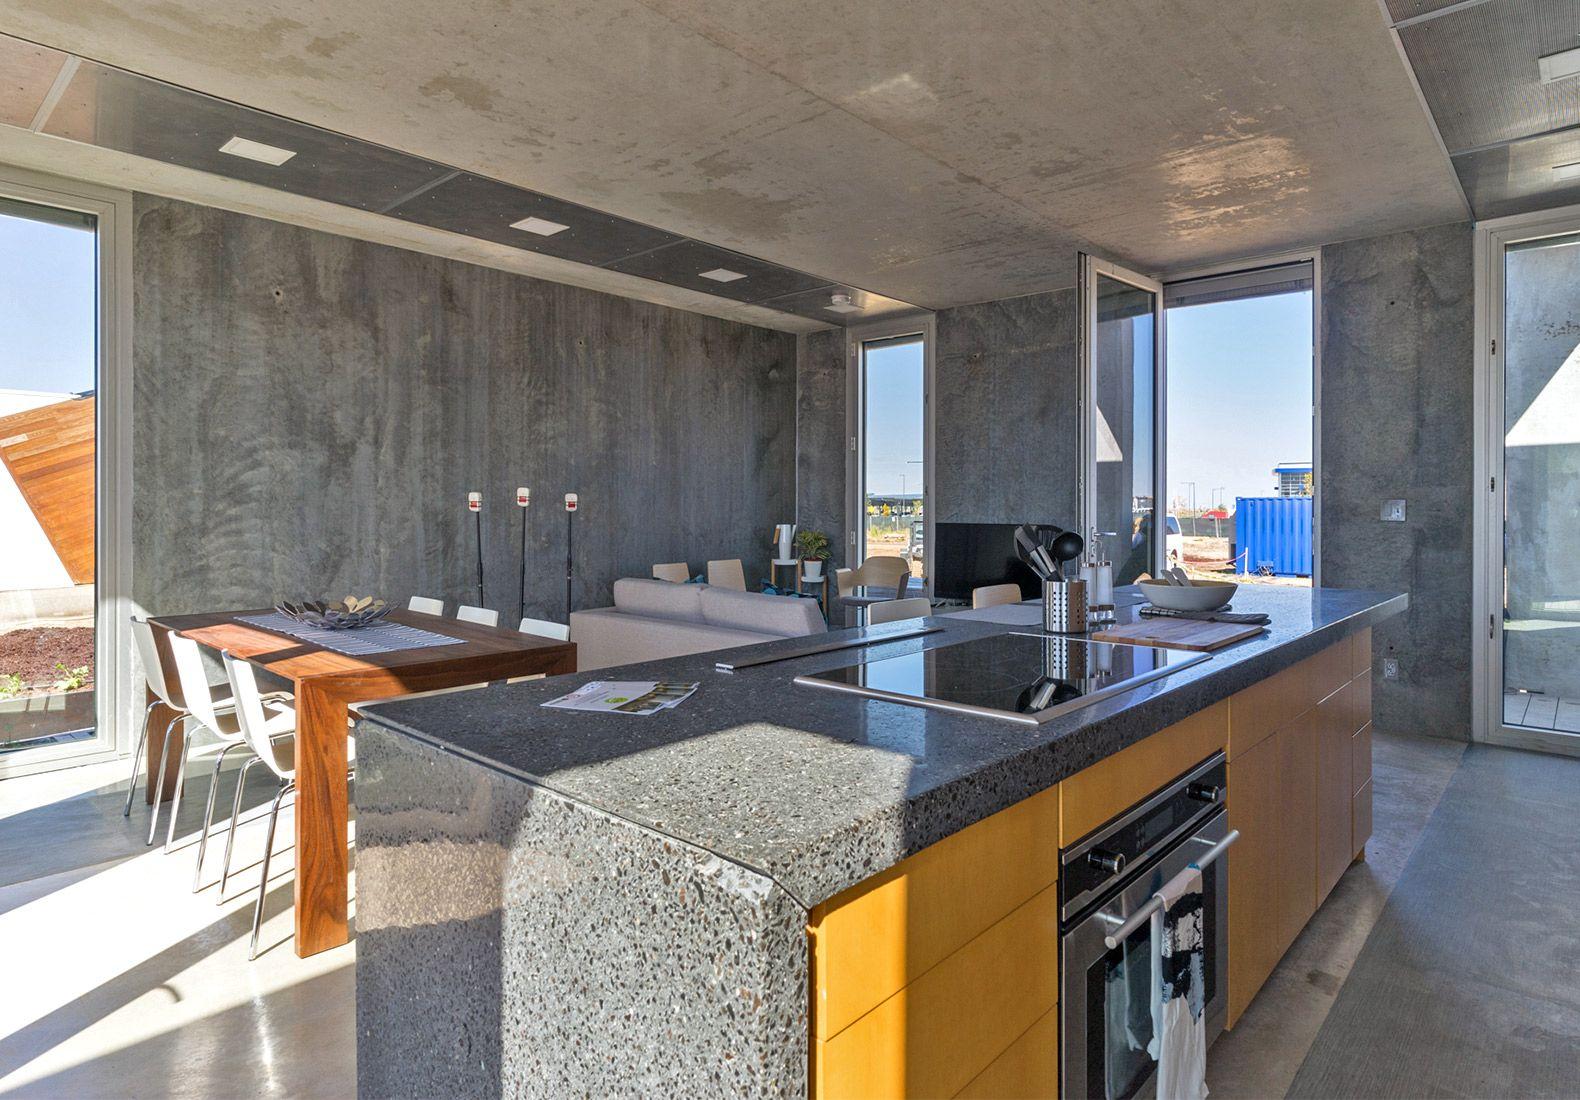 Crete House, Washington University Solar Decathlon, Prefabricated Concrete, Concrete  Homes, Solar Decathlon